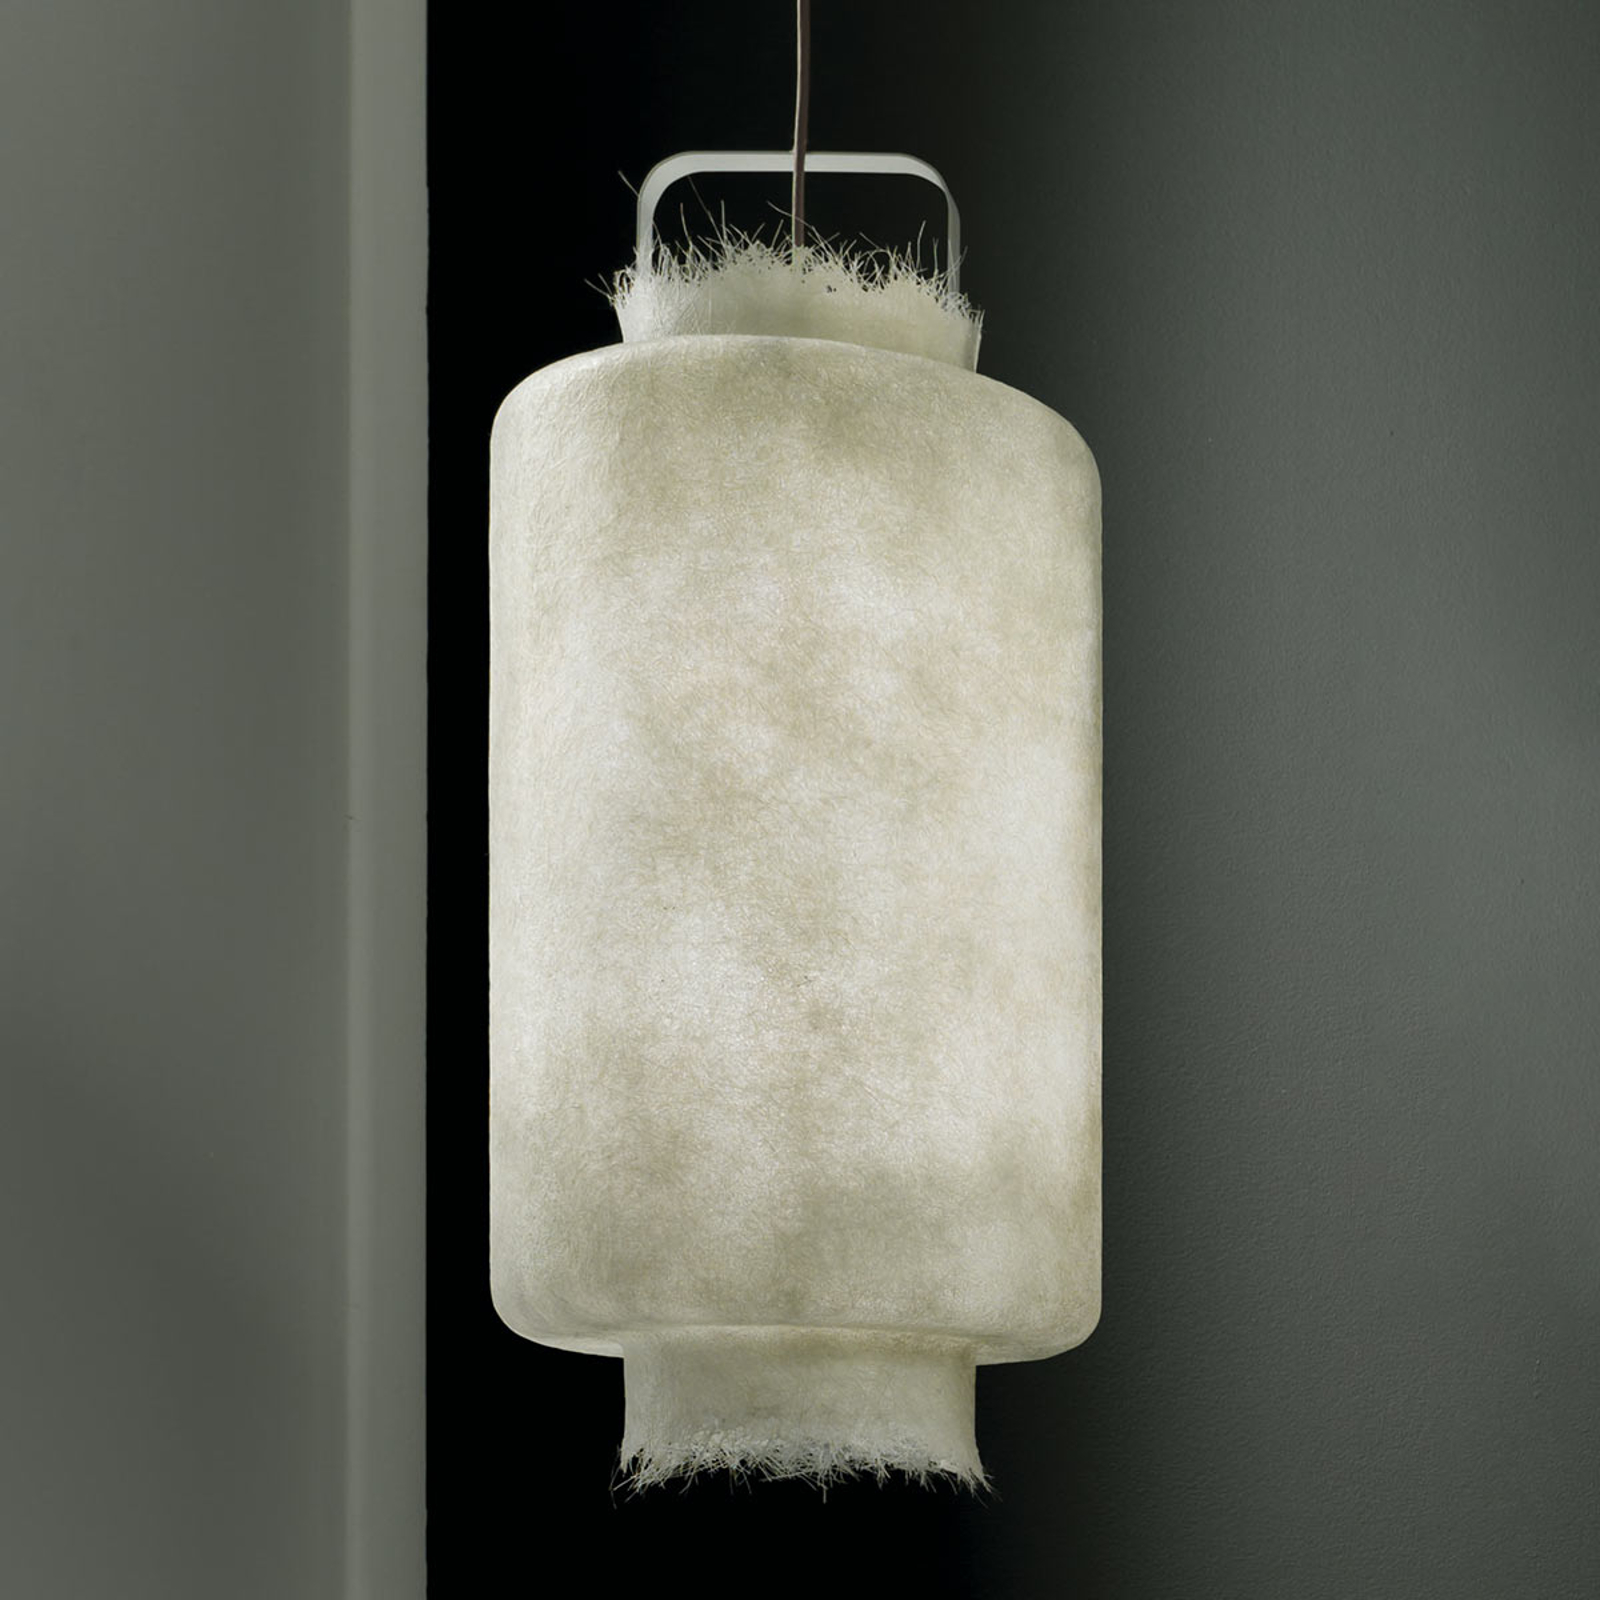 Lampa wisząca LED Kimono, włókno szklane, 40 cm